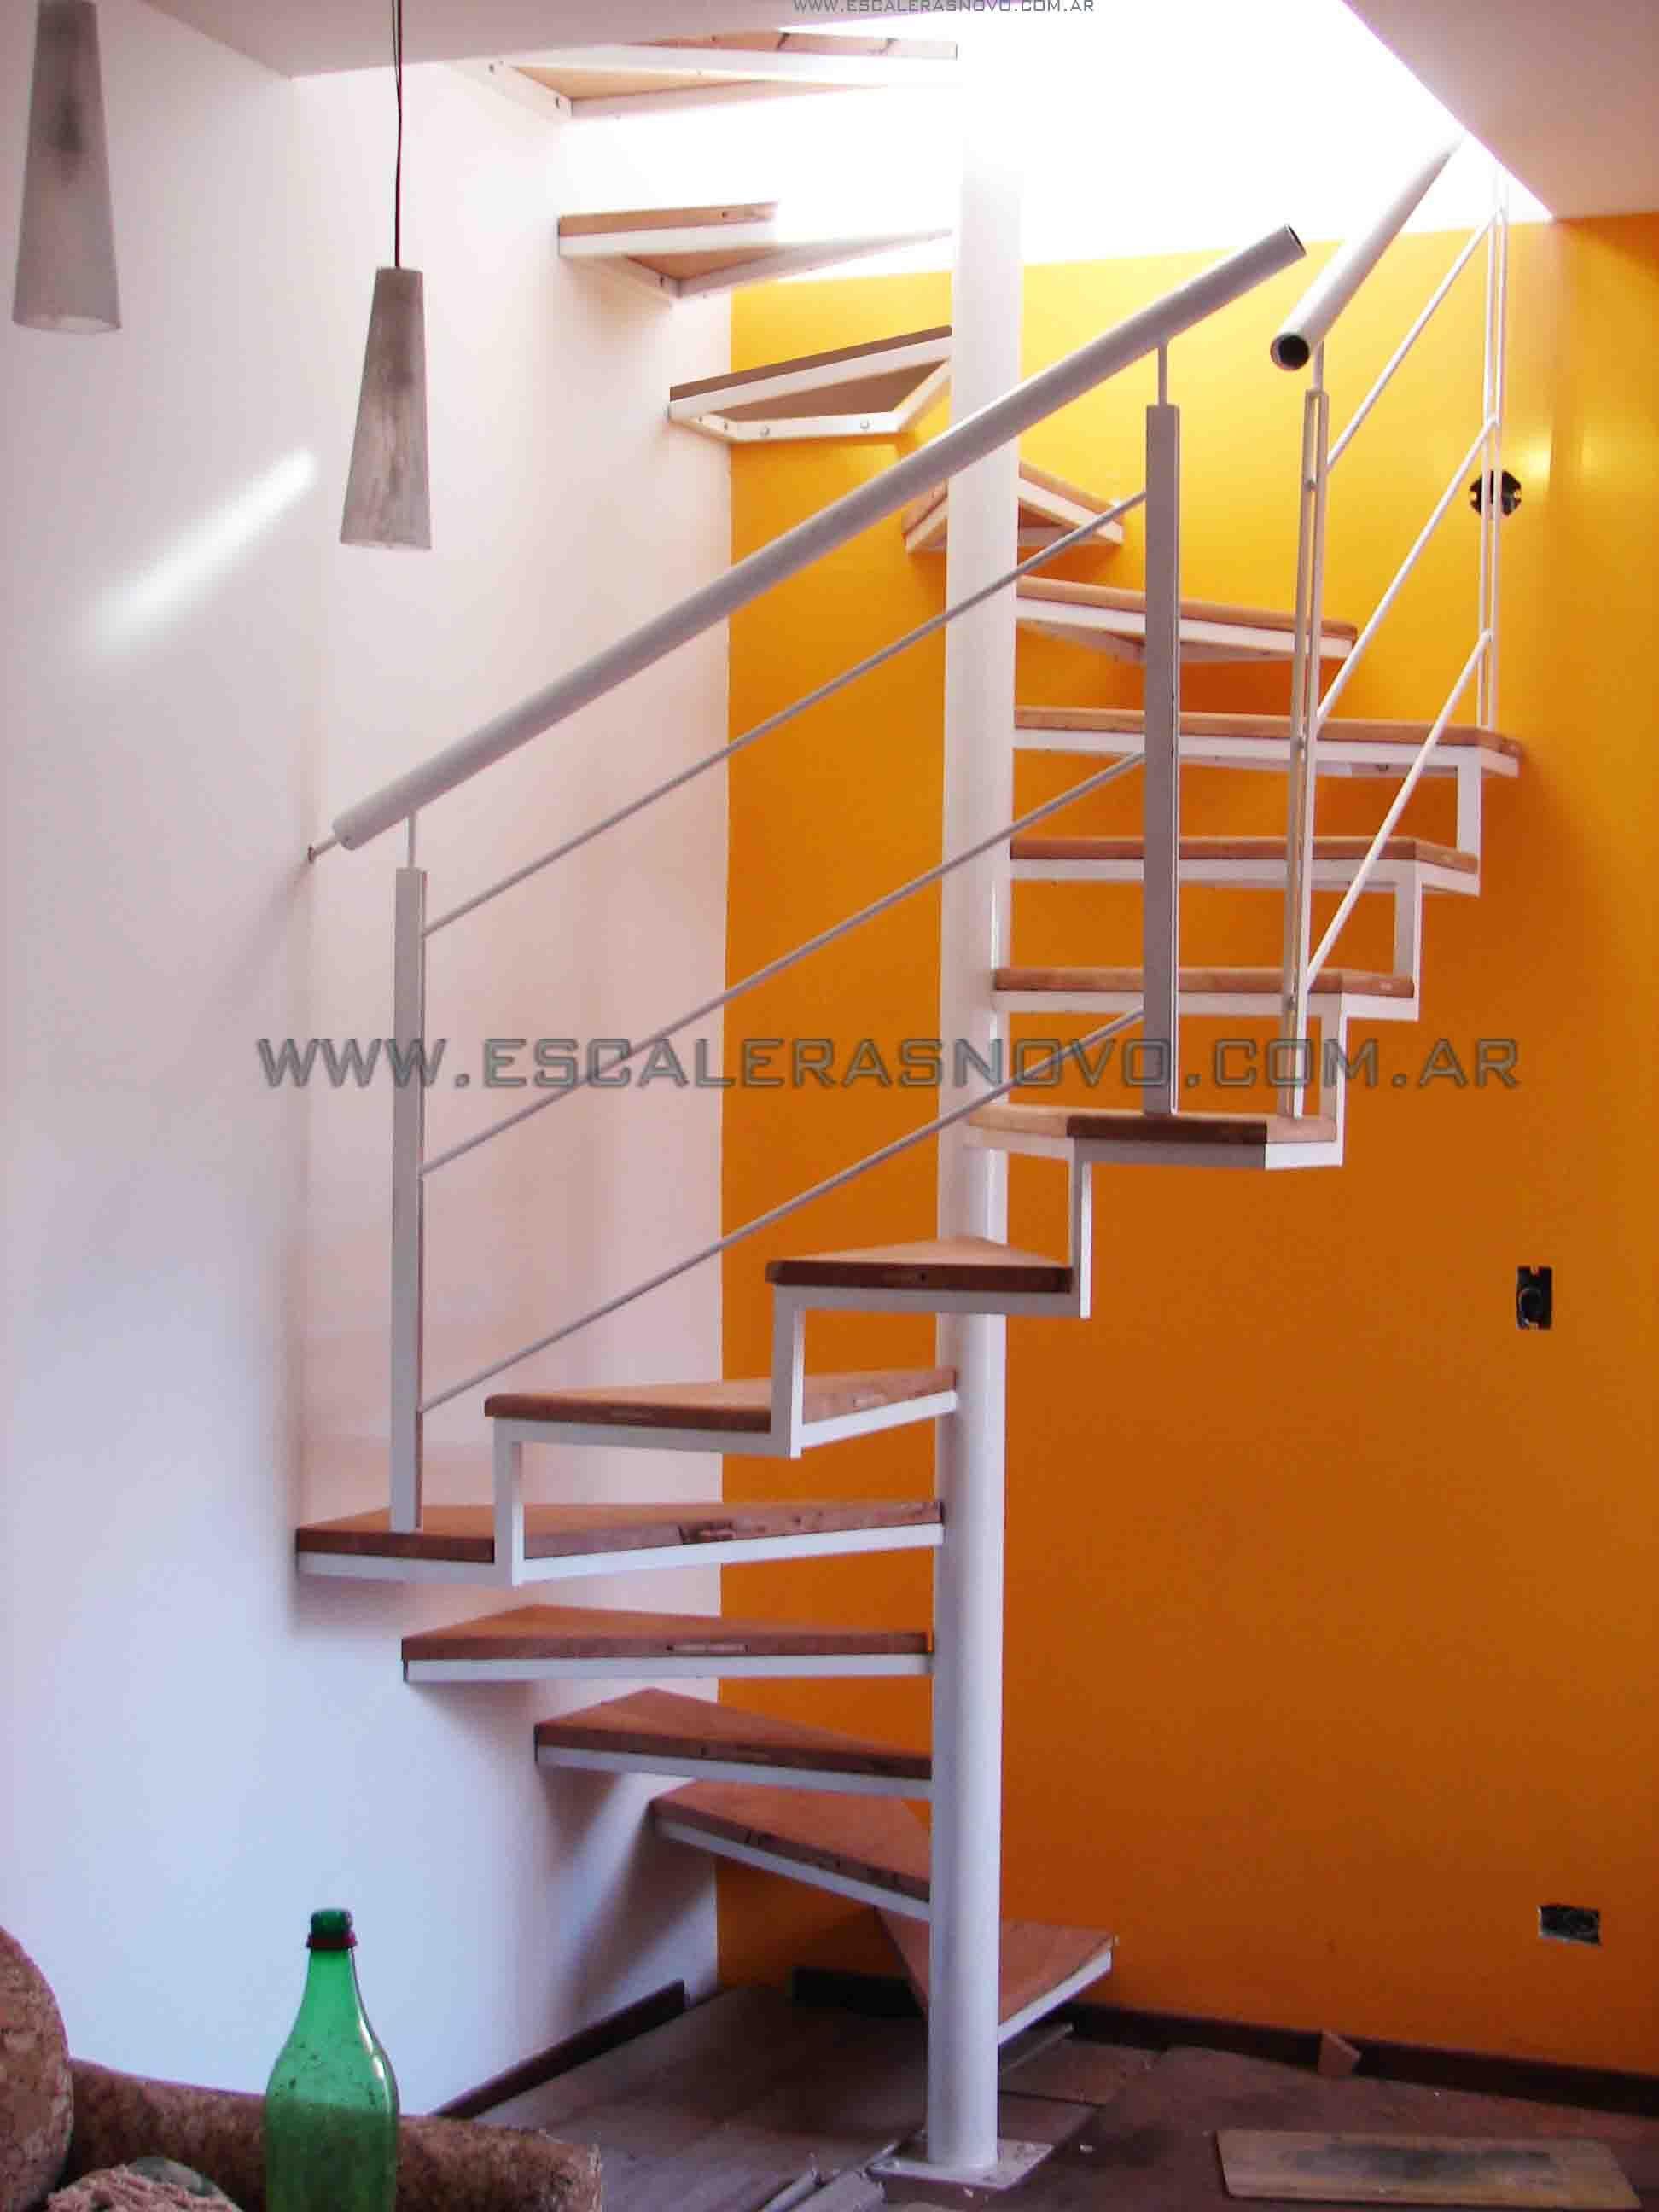 Escaleras caracol cuadrada deco pinterest escalera for Imagenes de gradas